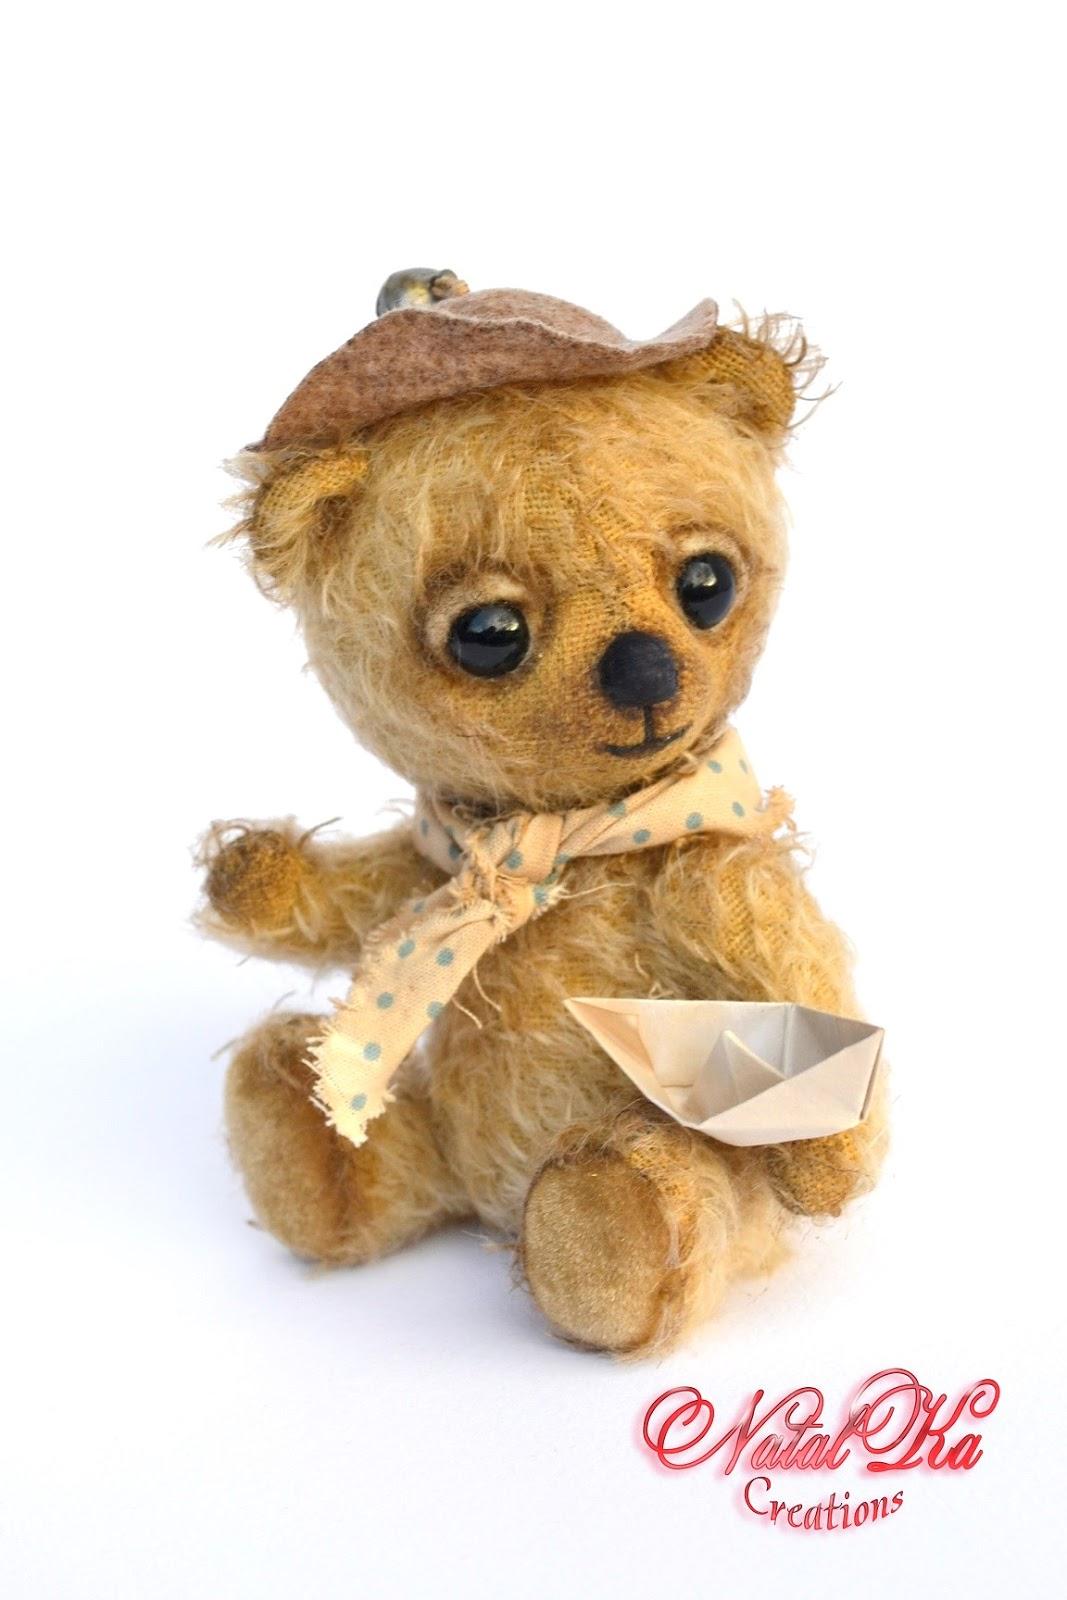 Artist teddy bear, artist bear, bear handmade, teddy bear jounted, teddy ooak, mohair, handmade by NatalKa Creations. Авторский медведь тедди, мишка тедди, медвежонок тедди из мохера от NatalKa Creations